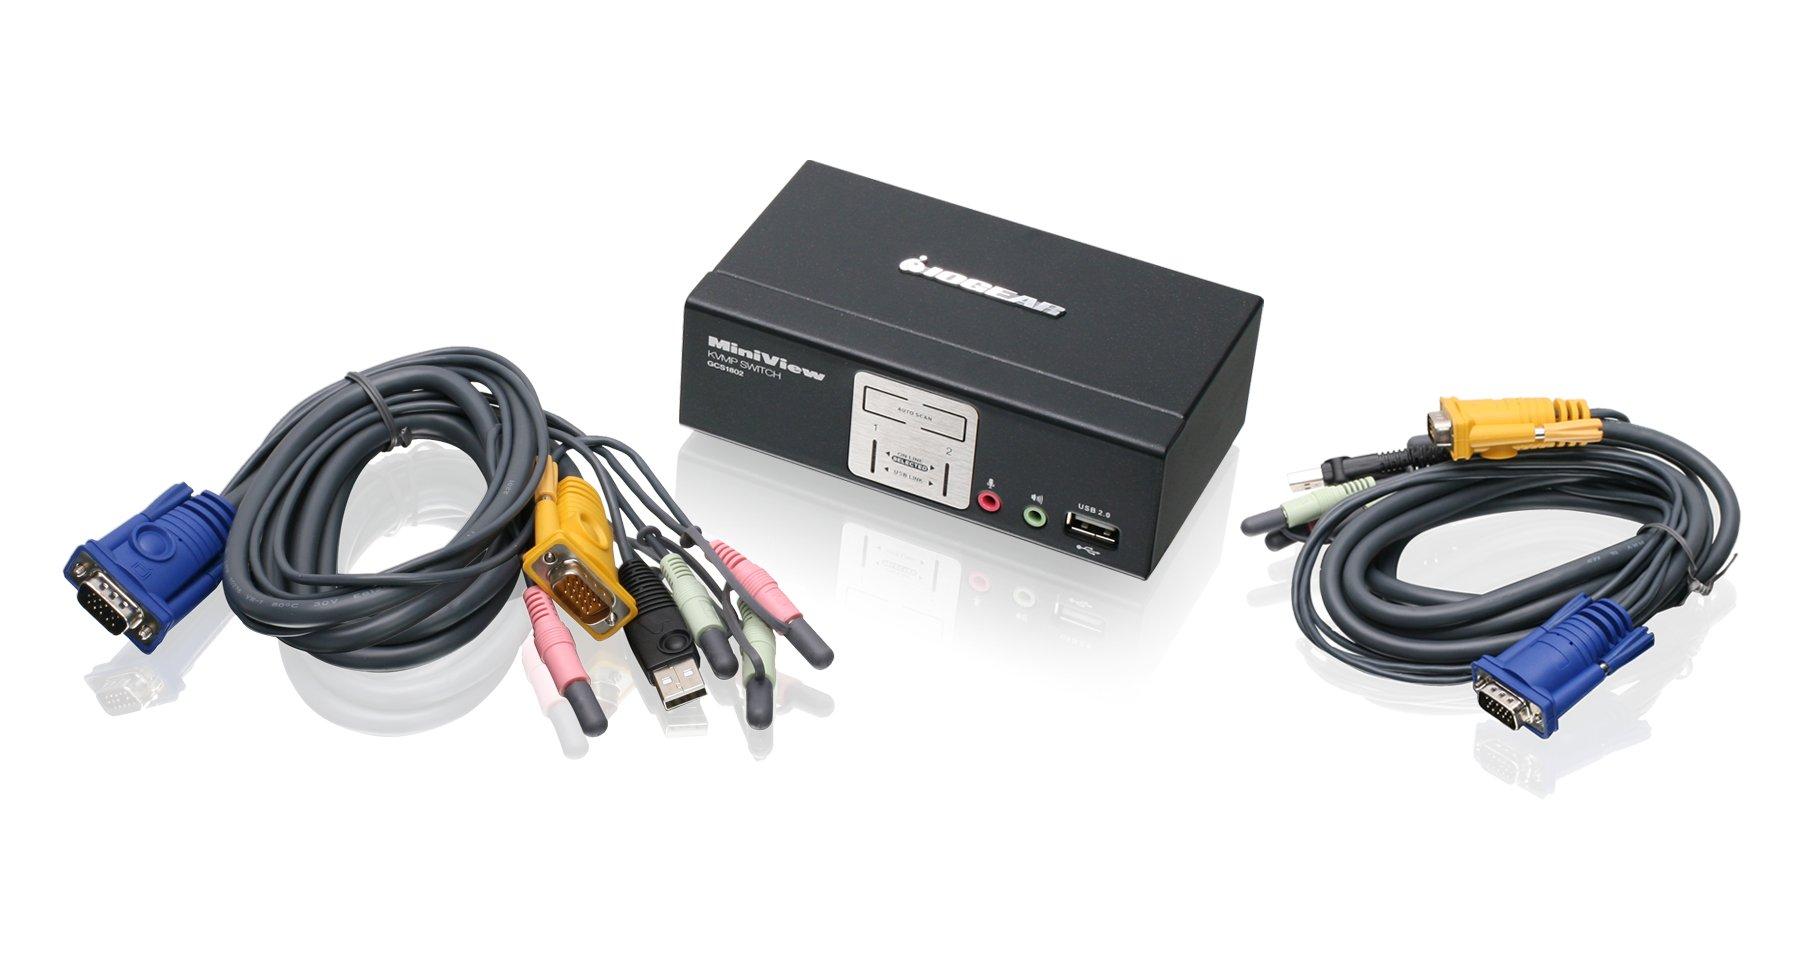 IOGEAR 2-Port KVMP Switch with USB 2.0 Hub and Audio, GCS1802